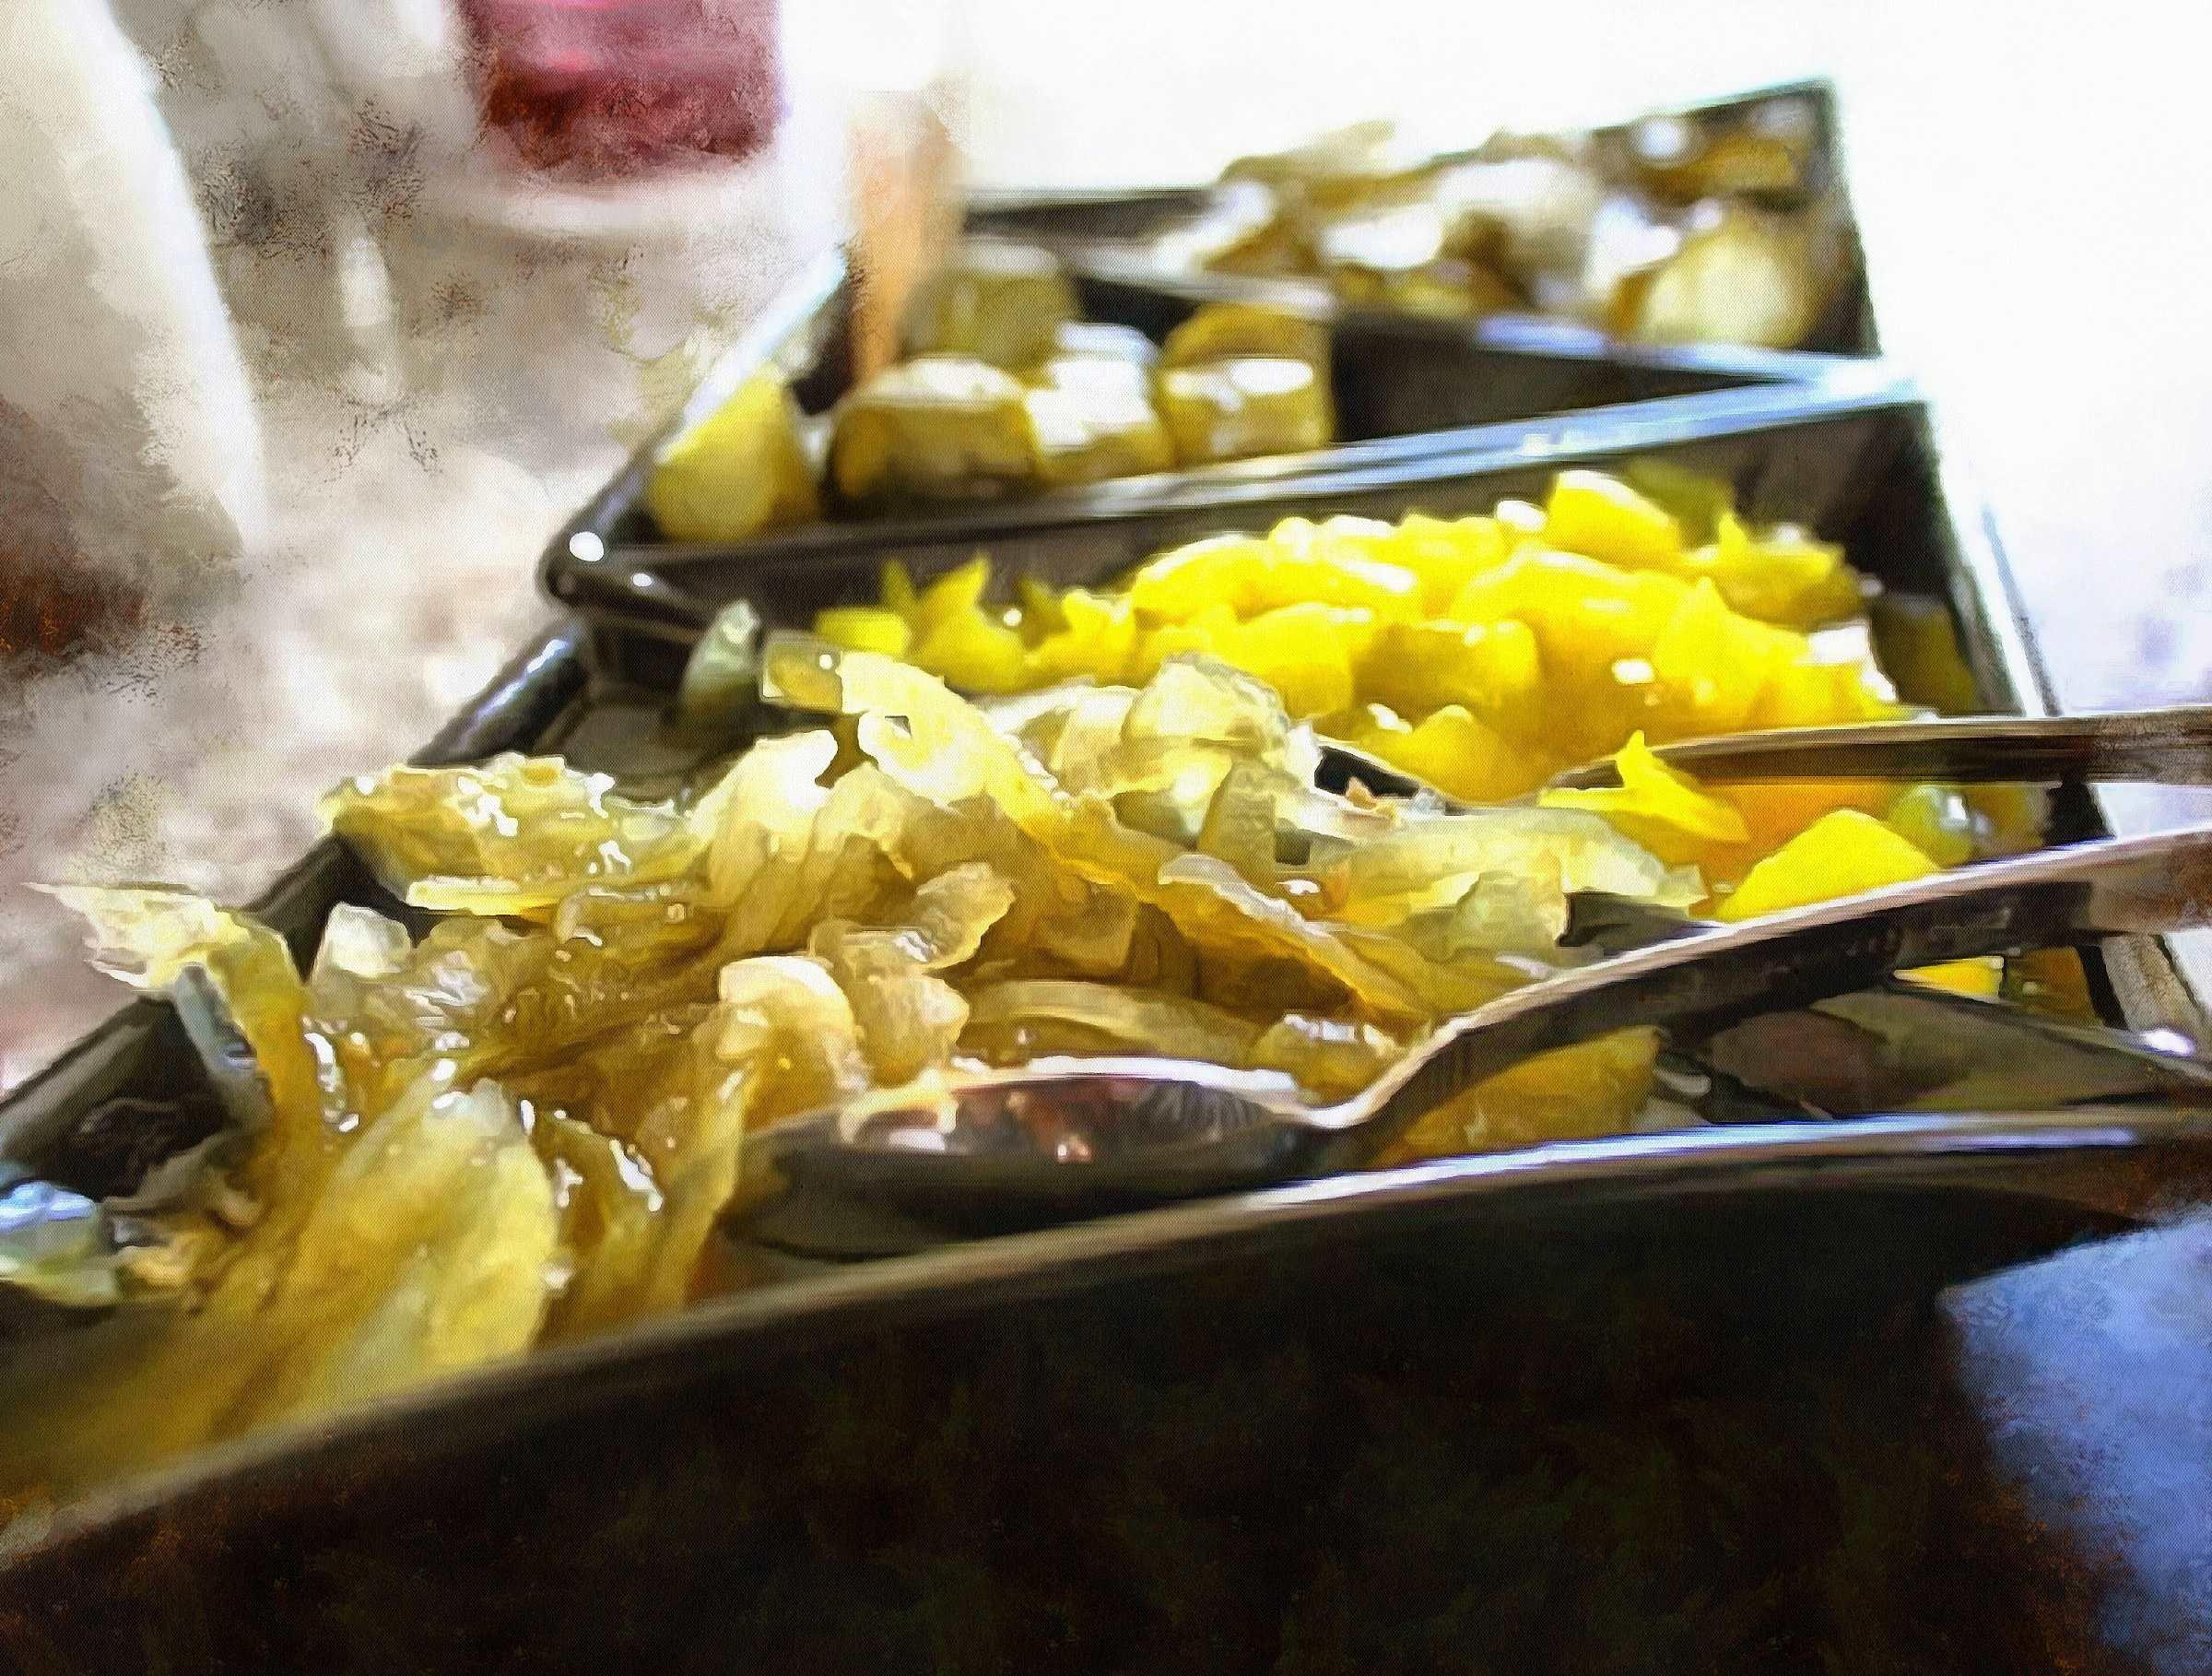 <br>food, sweets, apples, sweet sauce, utensils,